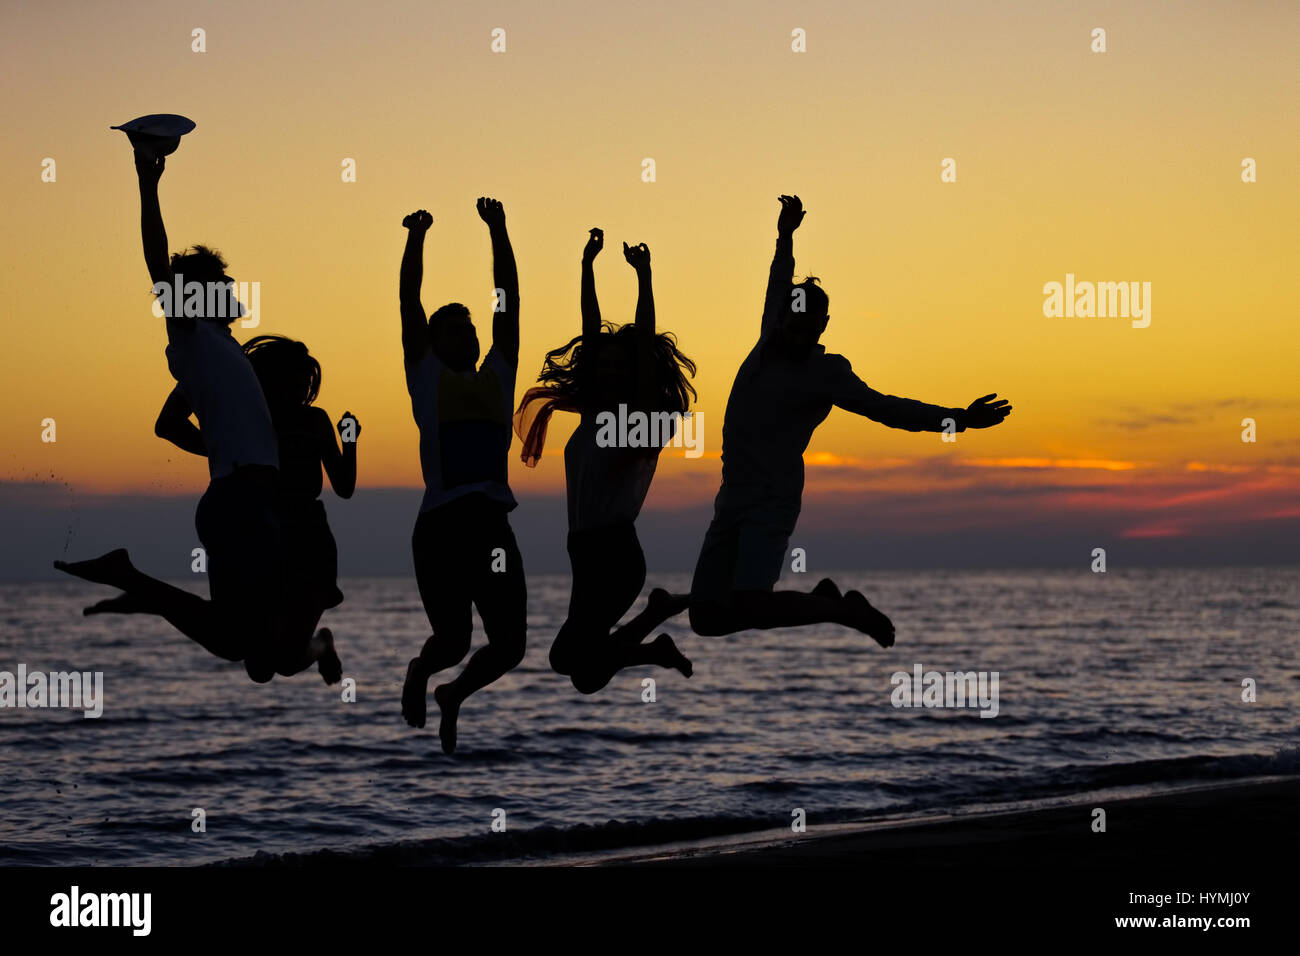 Silhouette der Freunde springen am Strand bei Sonnenuntergang Stockbild